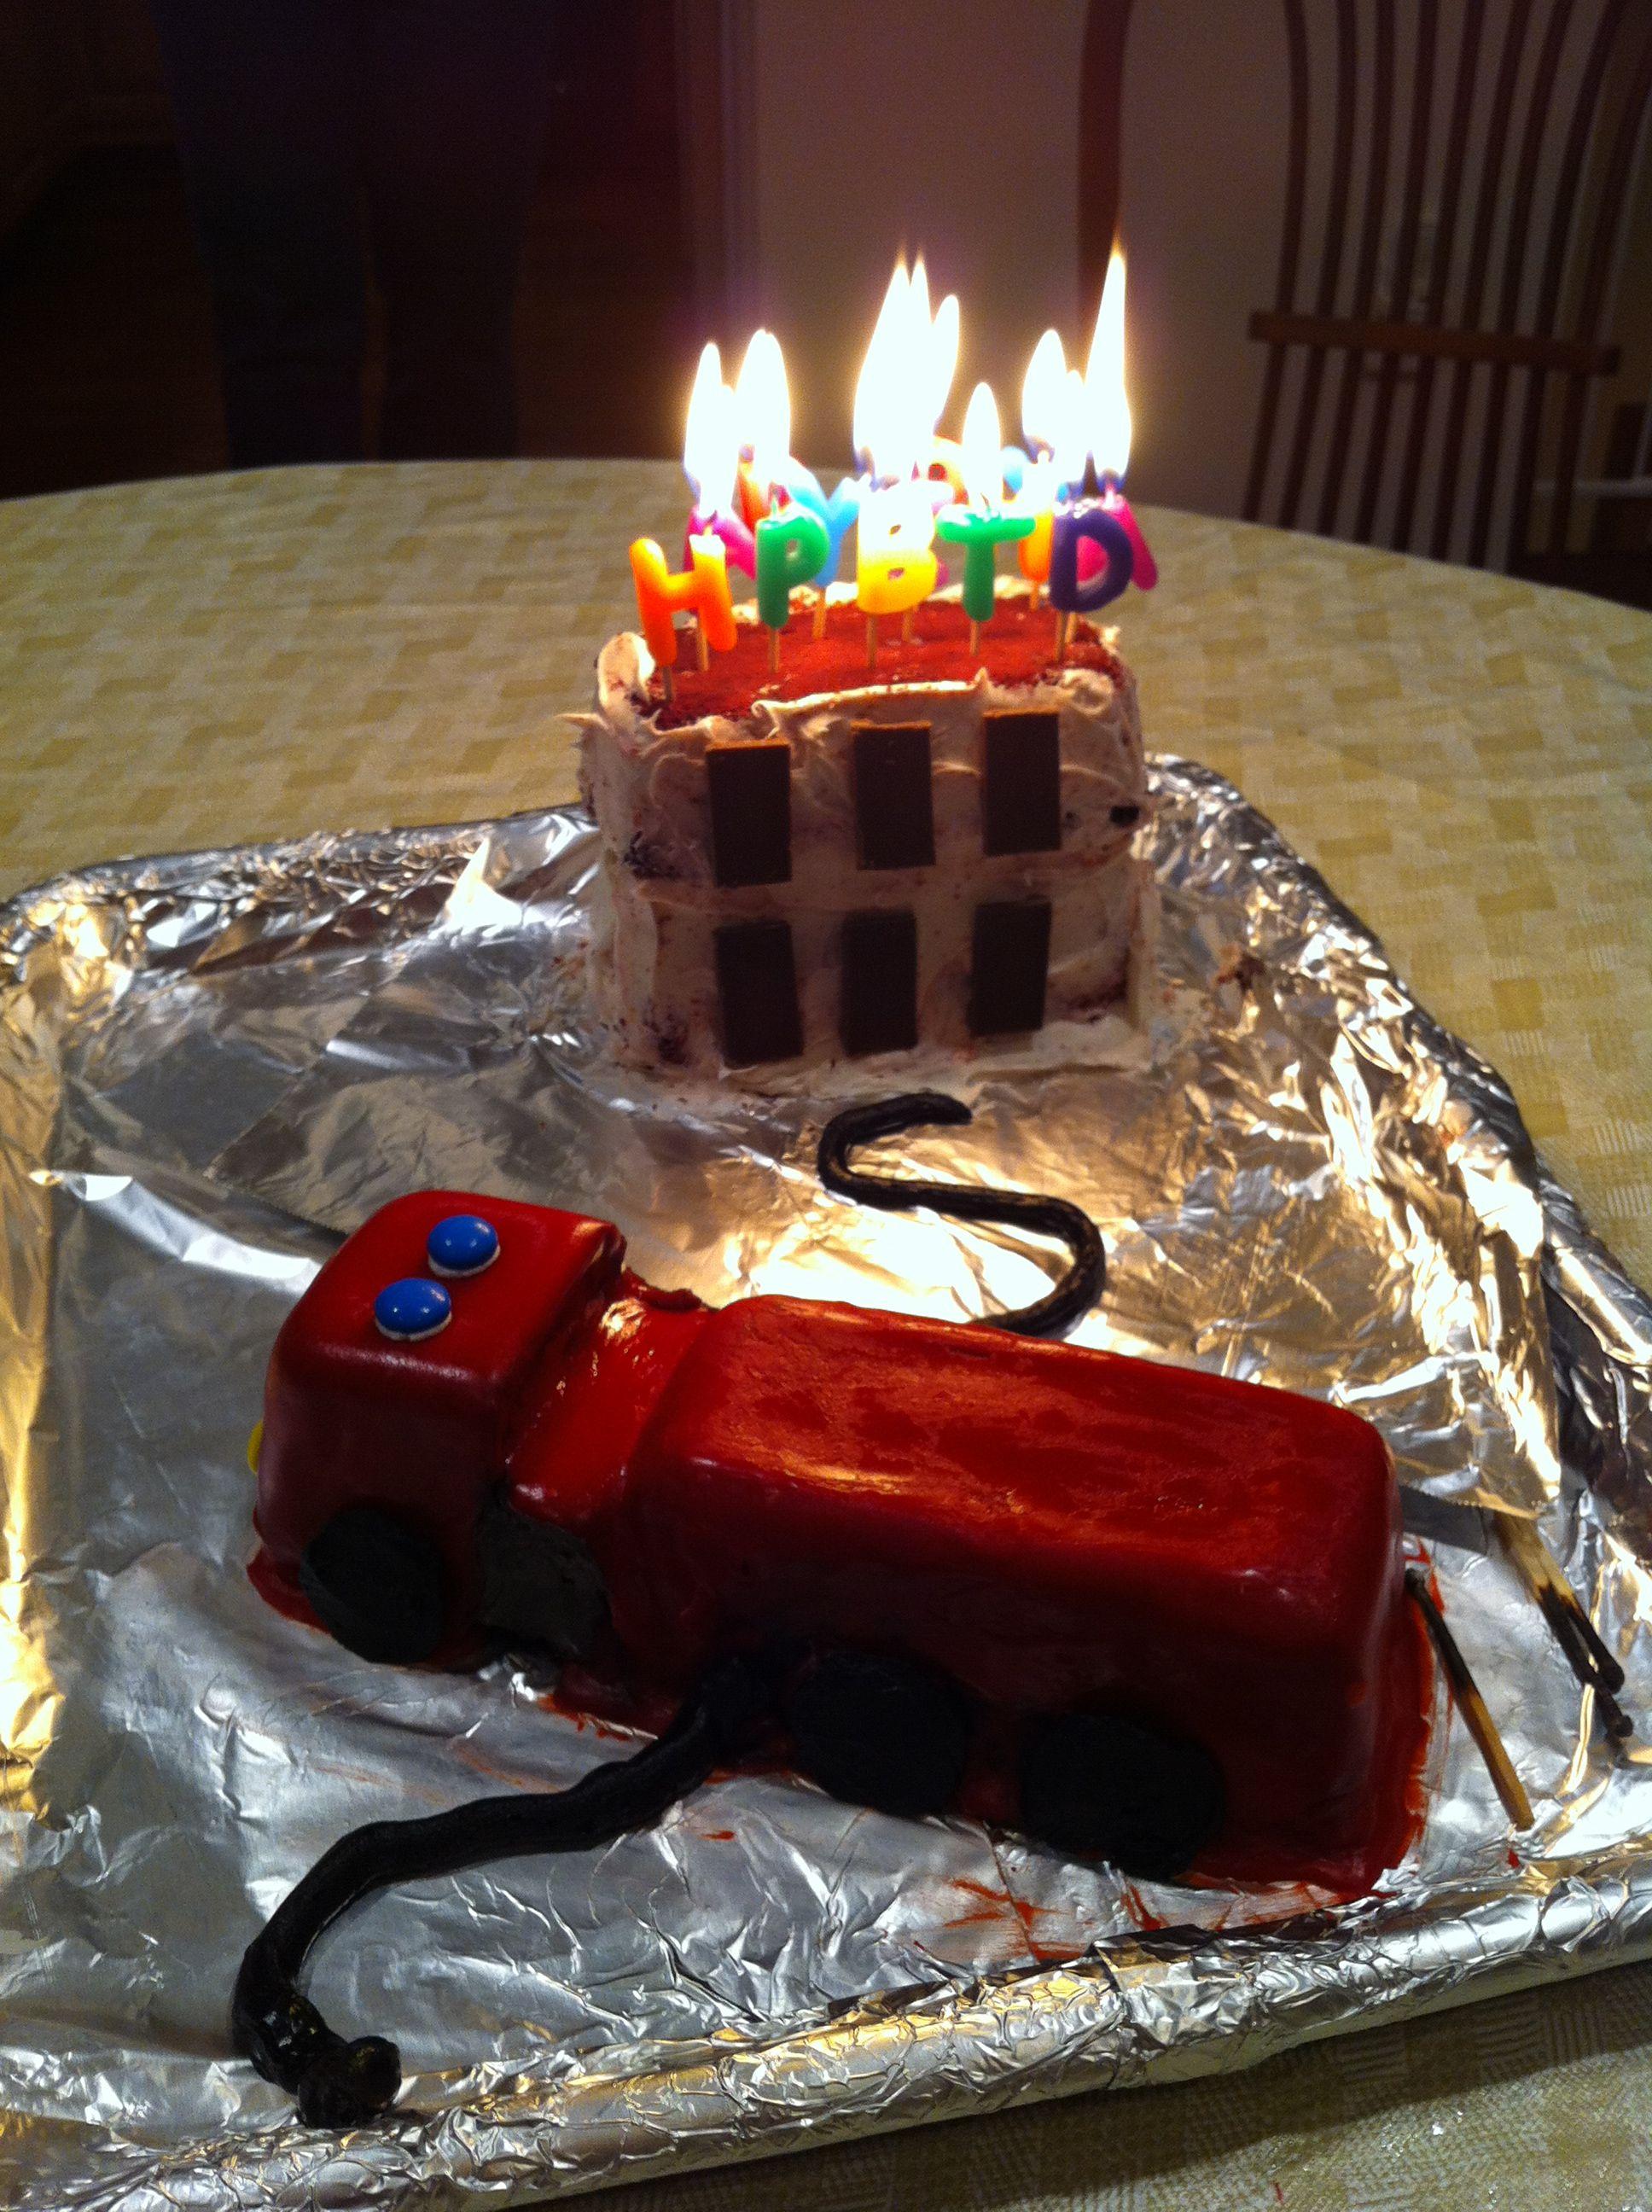 Fire Truck Burning Building Cake